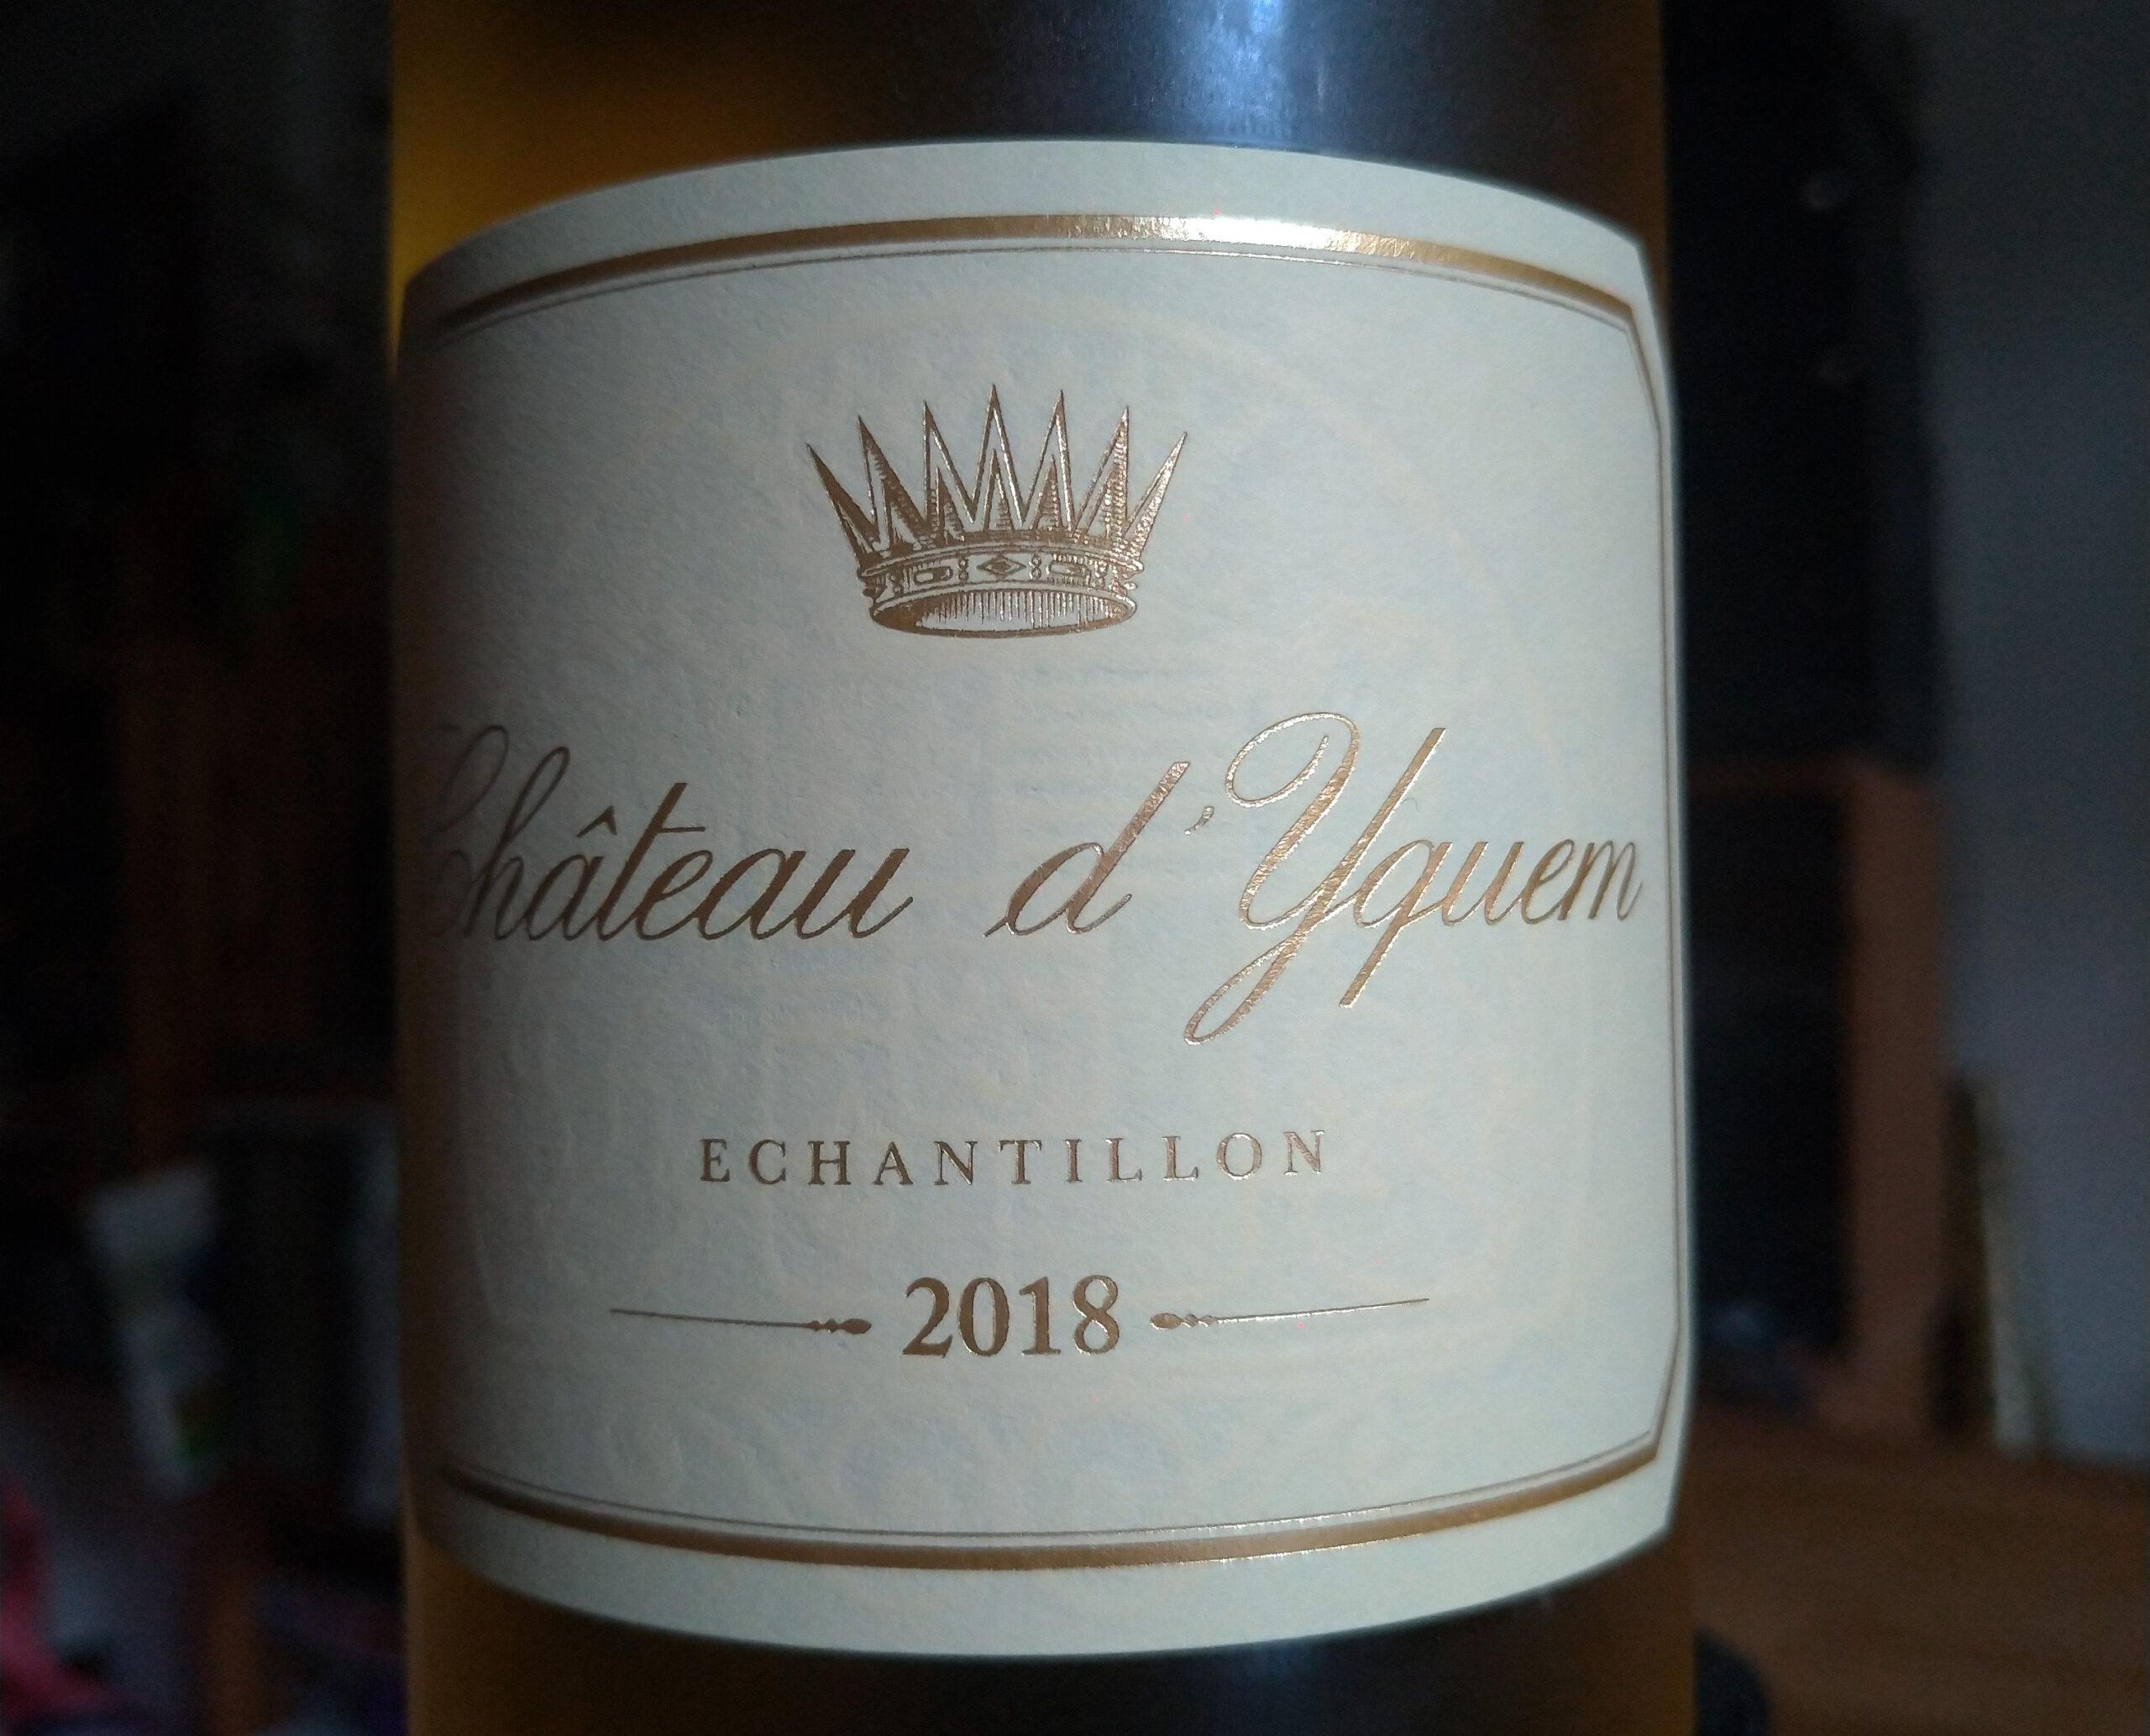 Yquem 2018 - yvesbeck.wine